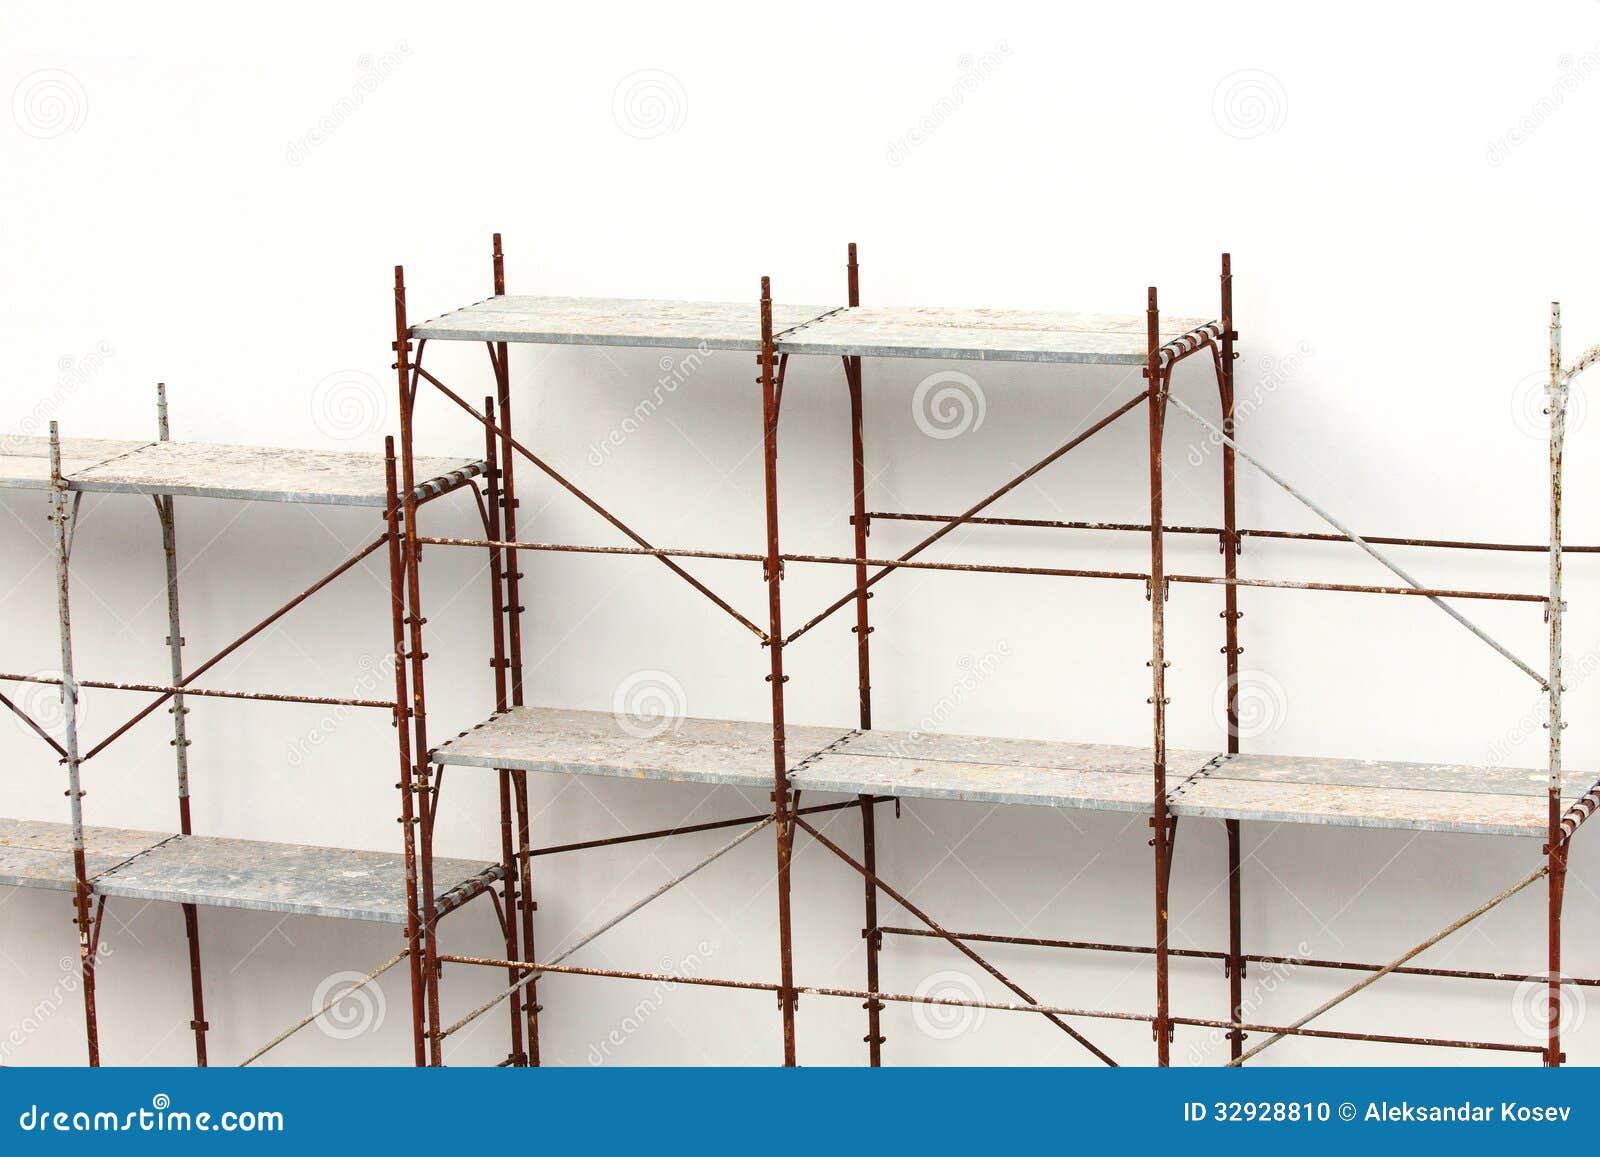 Construction Scaffolding Design : Scaffolding stock photo image